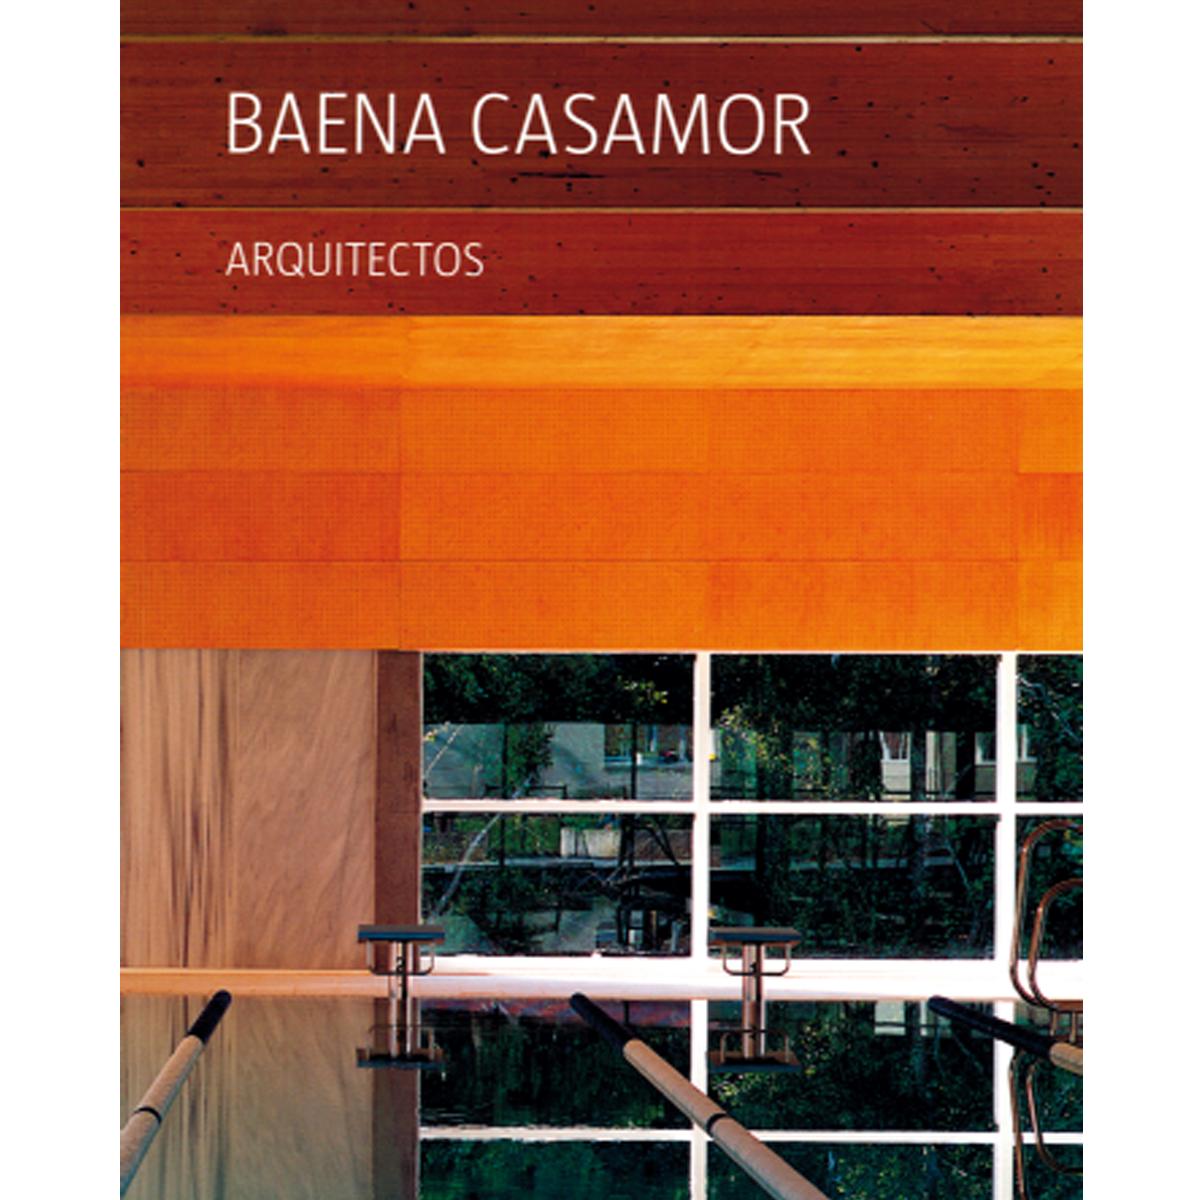 Baena Casamor arquitectos